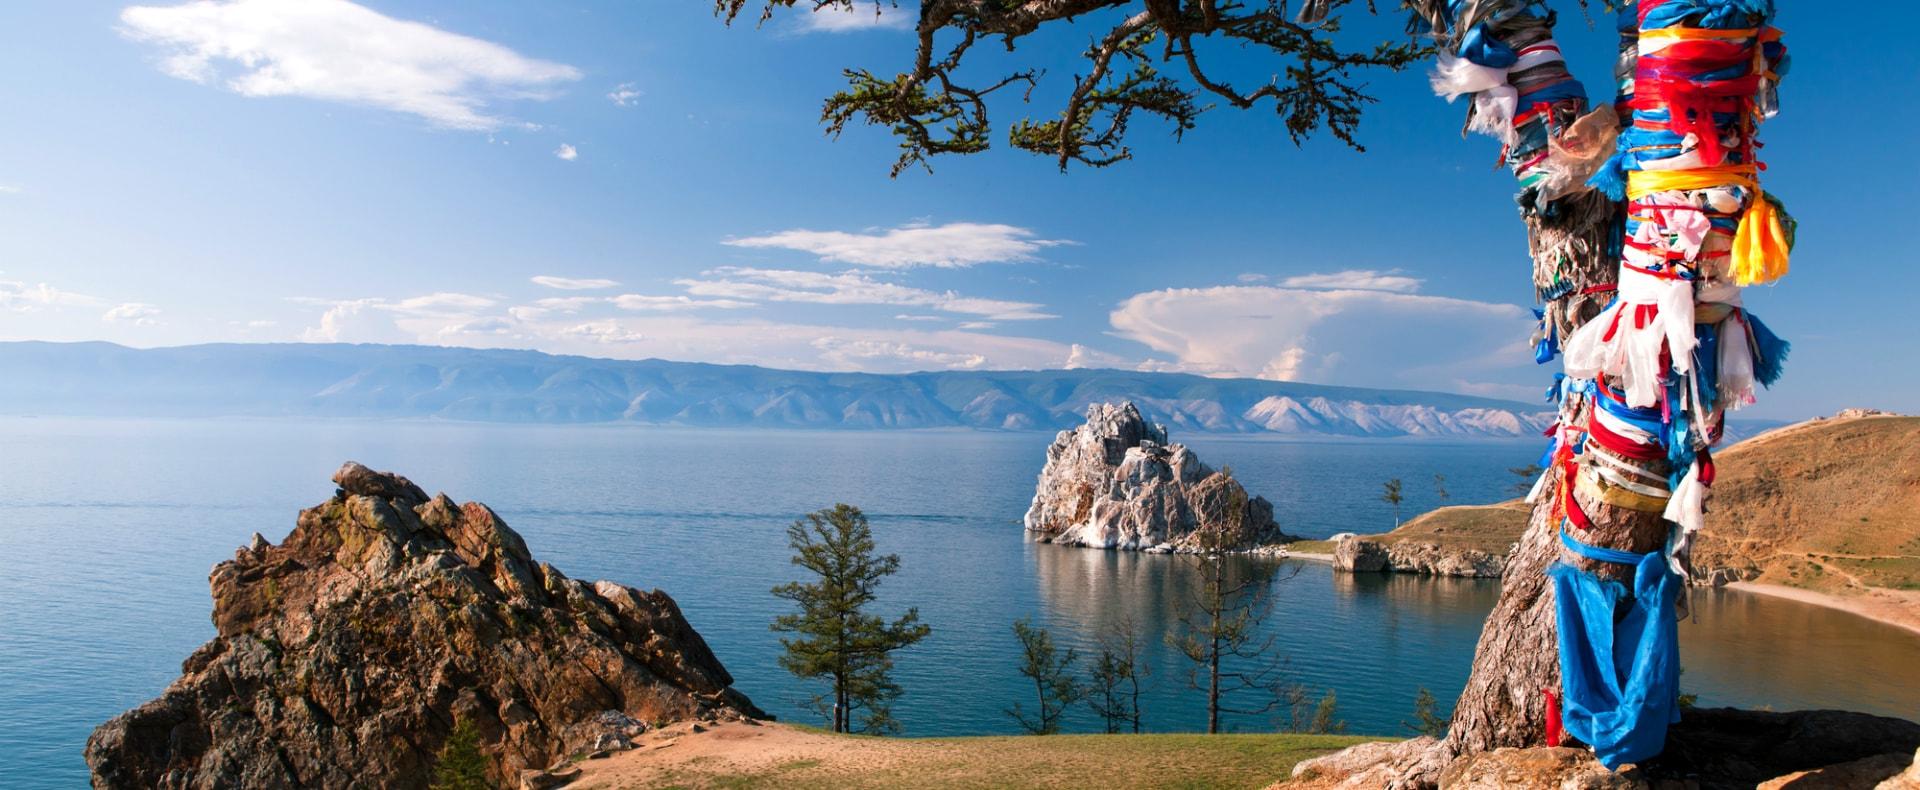 Lake Baikal, Russia Gallery